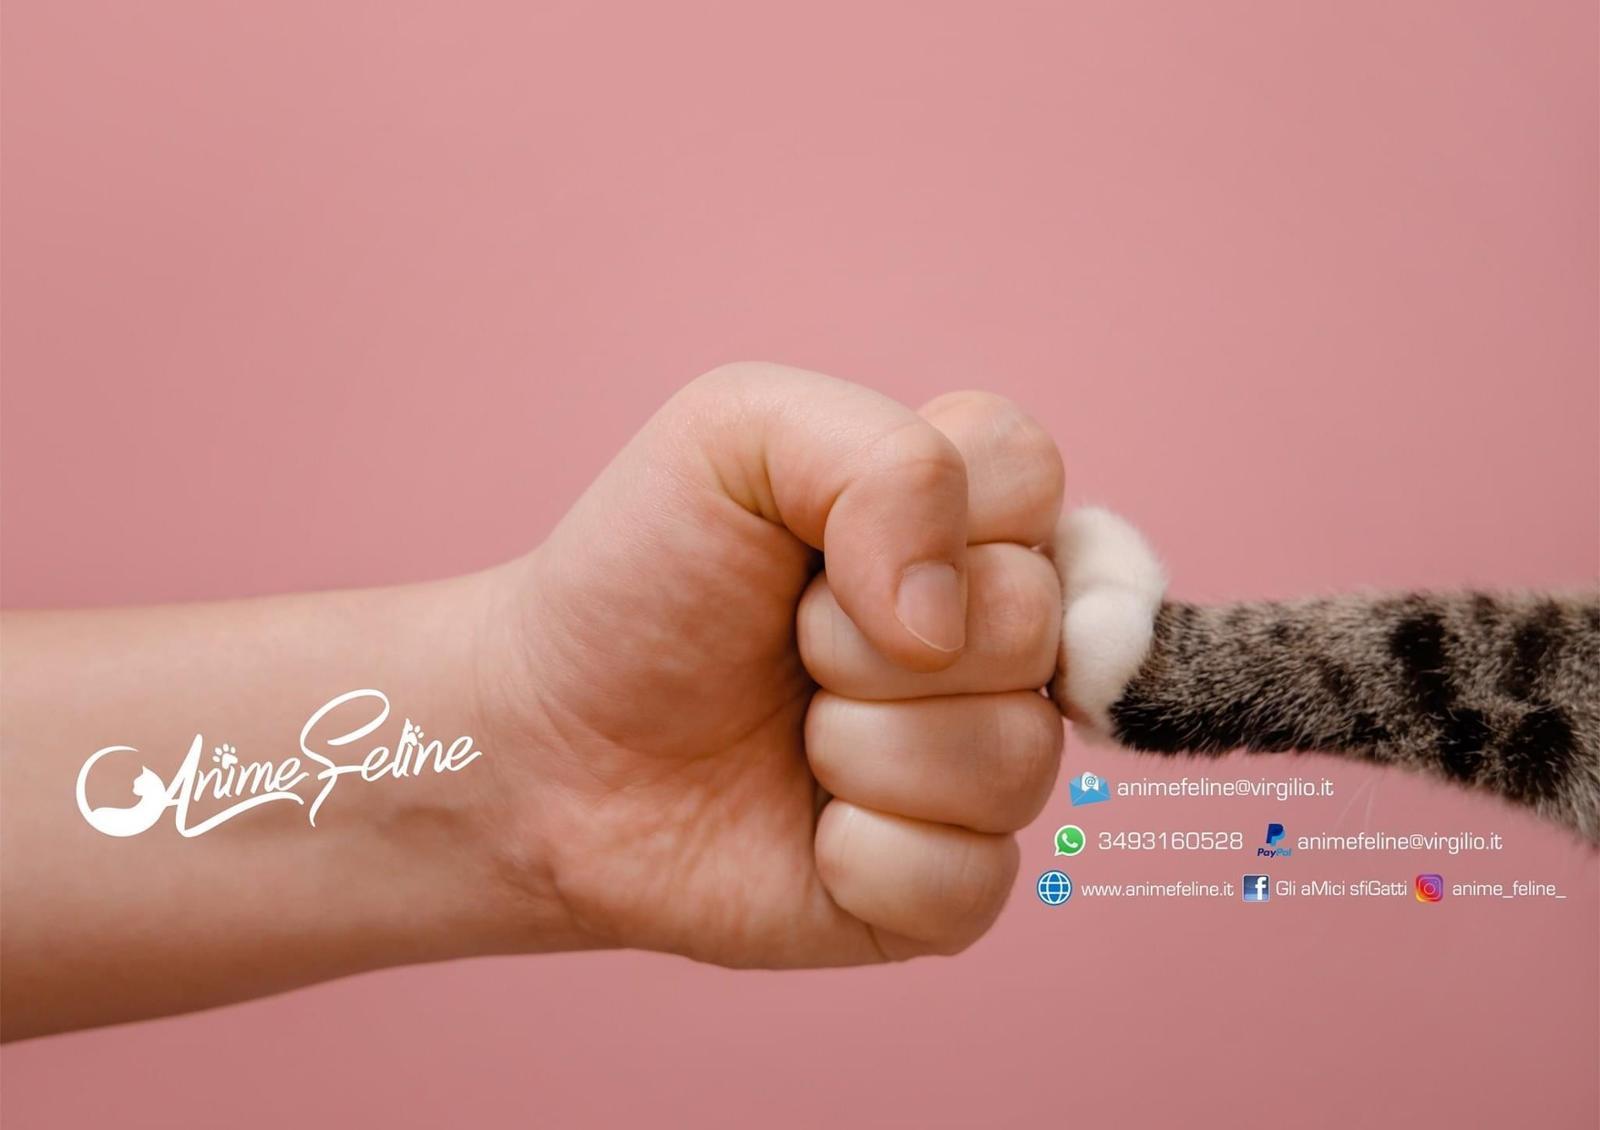 Associazione Anime Feline Odv